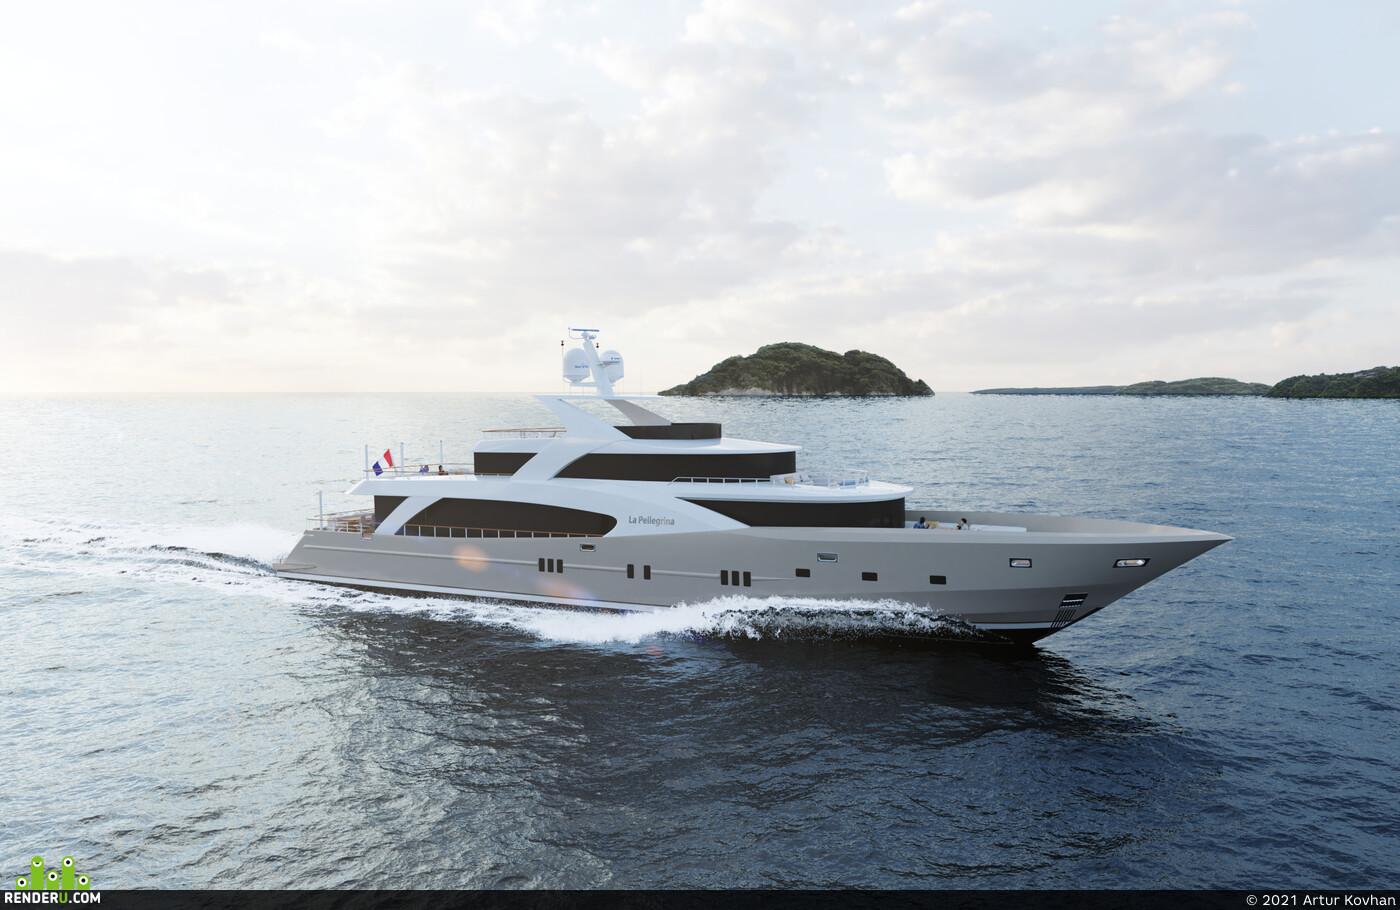 Yacht, PhoenixFD, Water Simulation, яхта, Симуляция воды